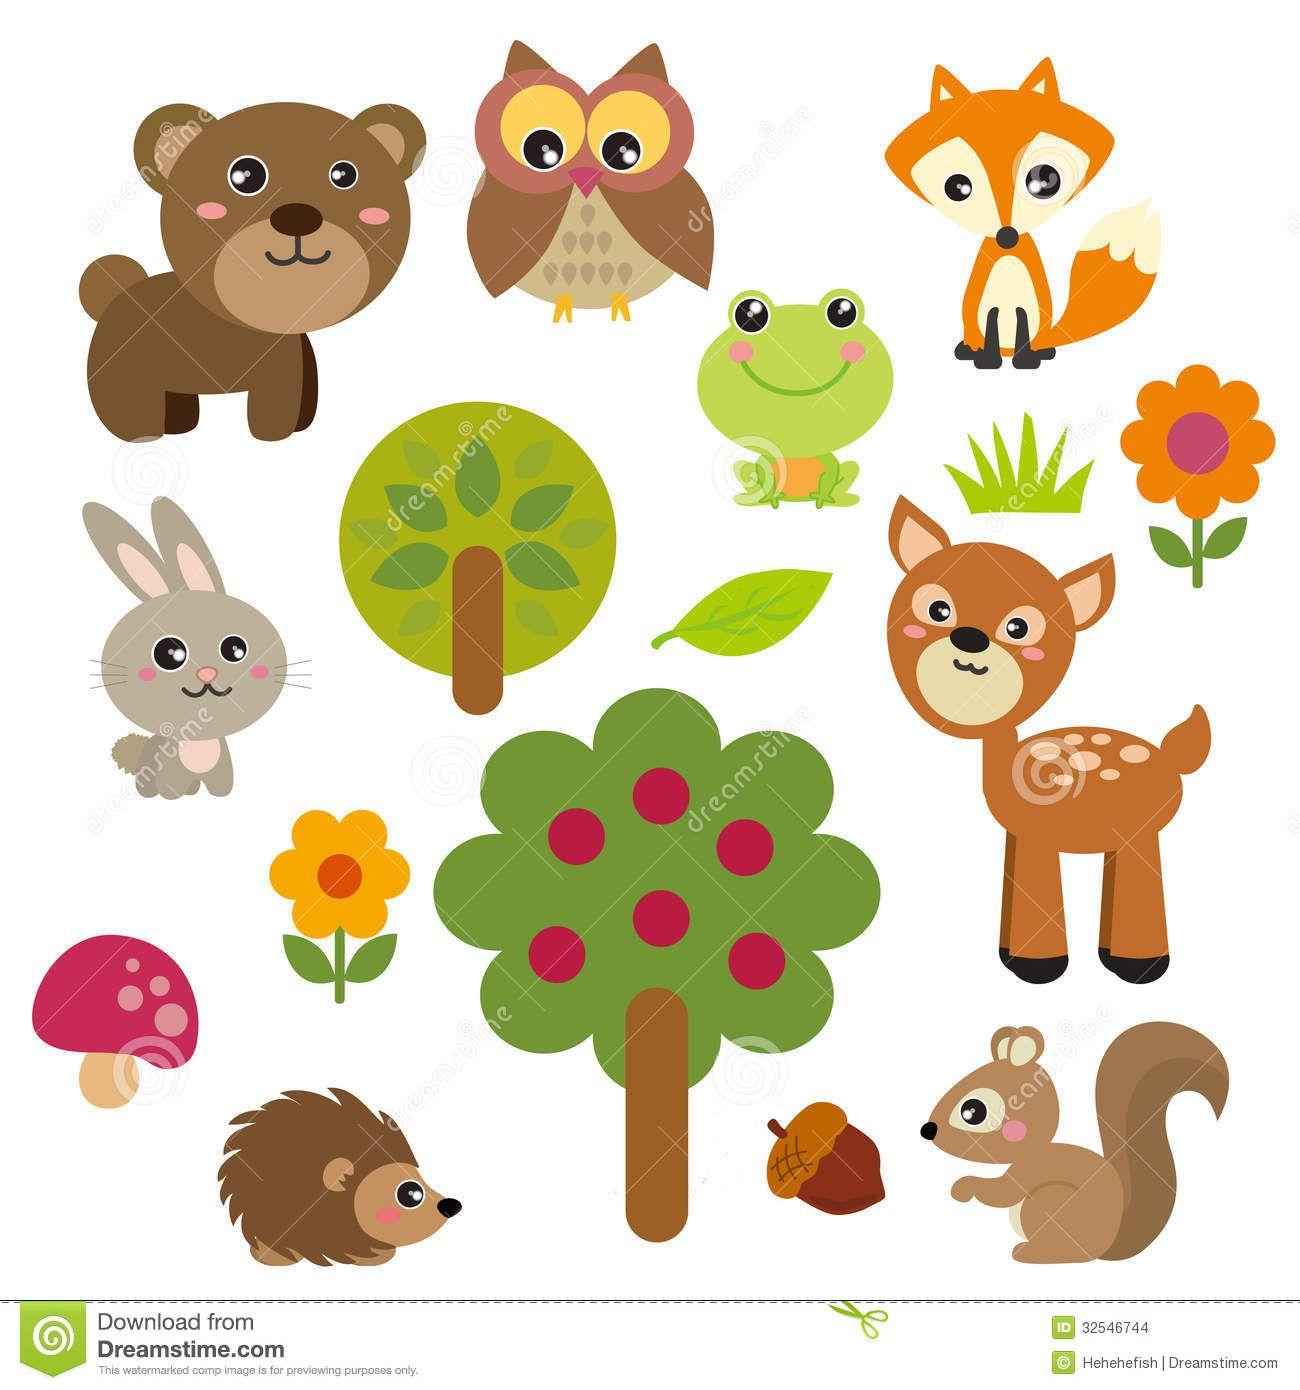 Realistic Woodland Animals Clipart Cliparthut Free Clipart Animal Clipart Cute Animal Clipart Cute Animal Illustration